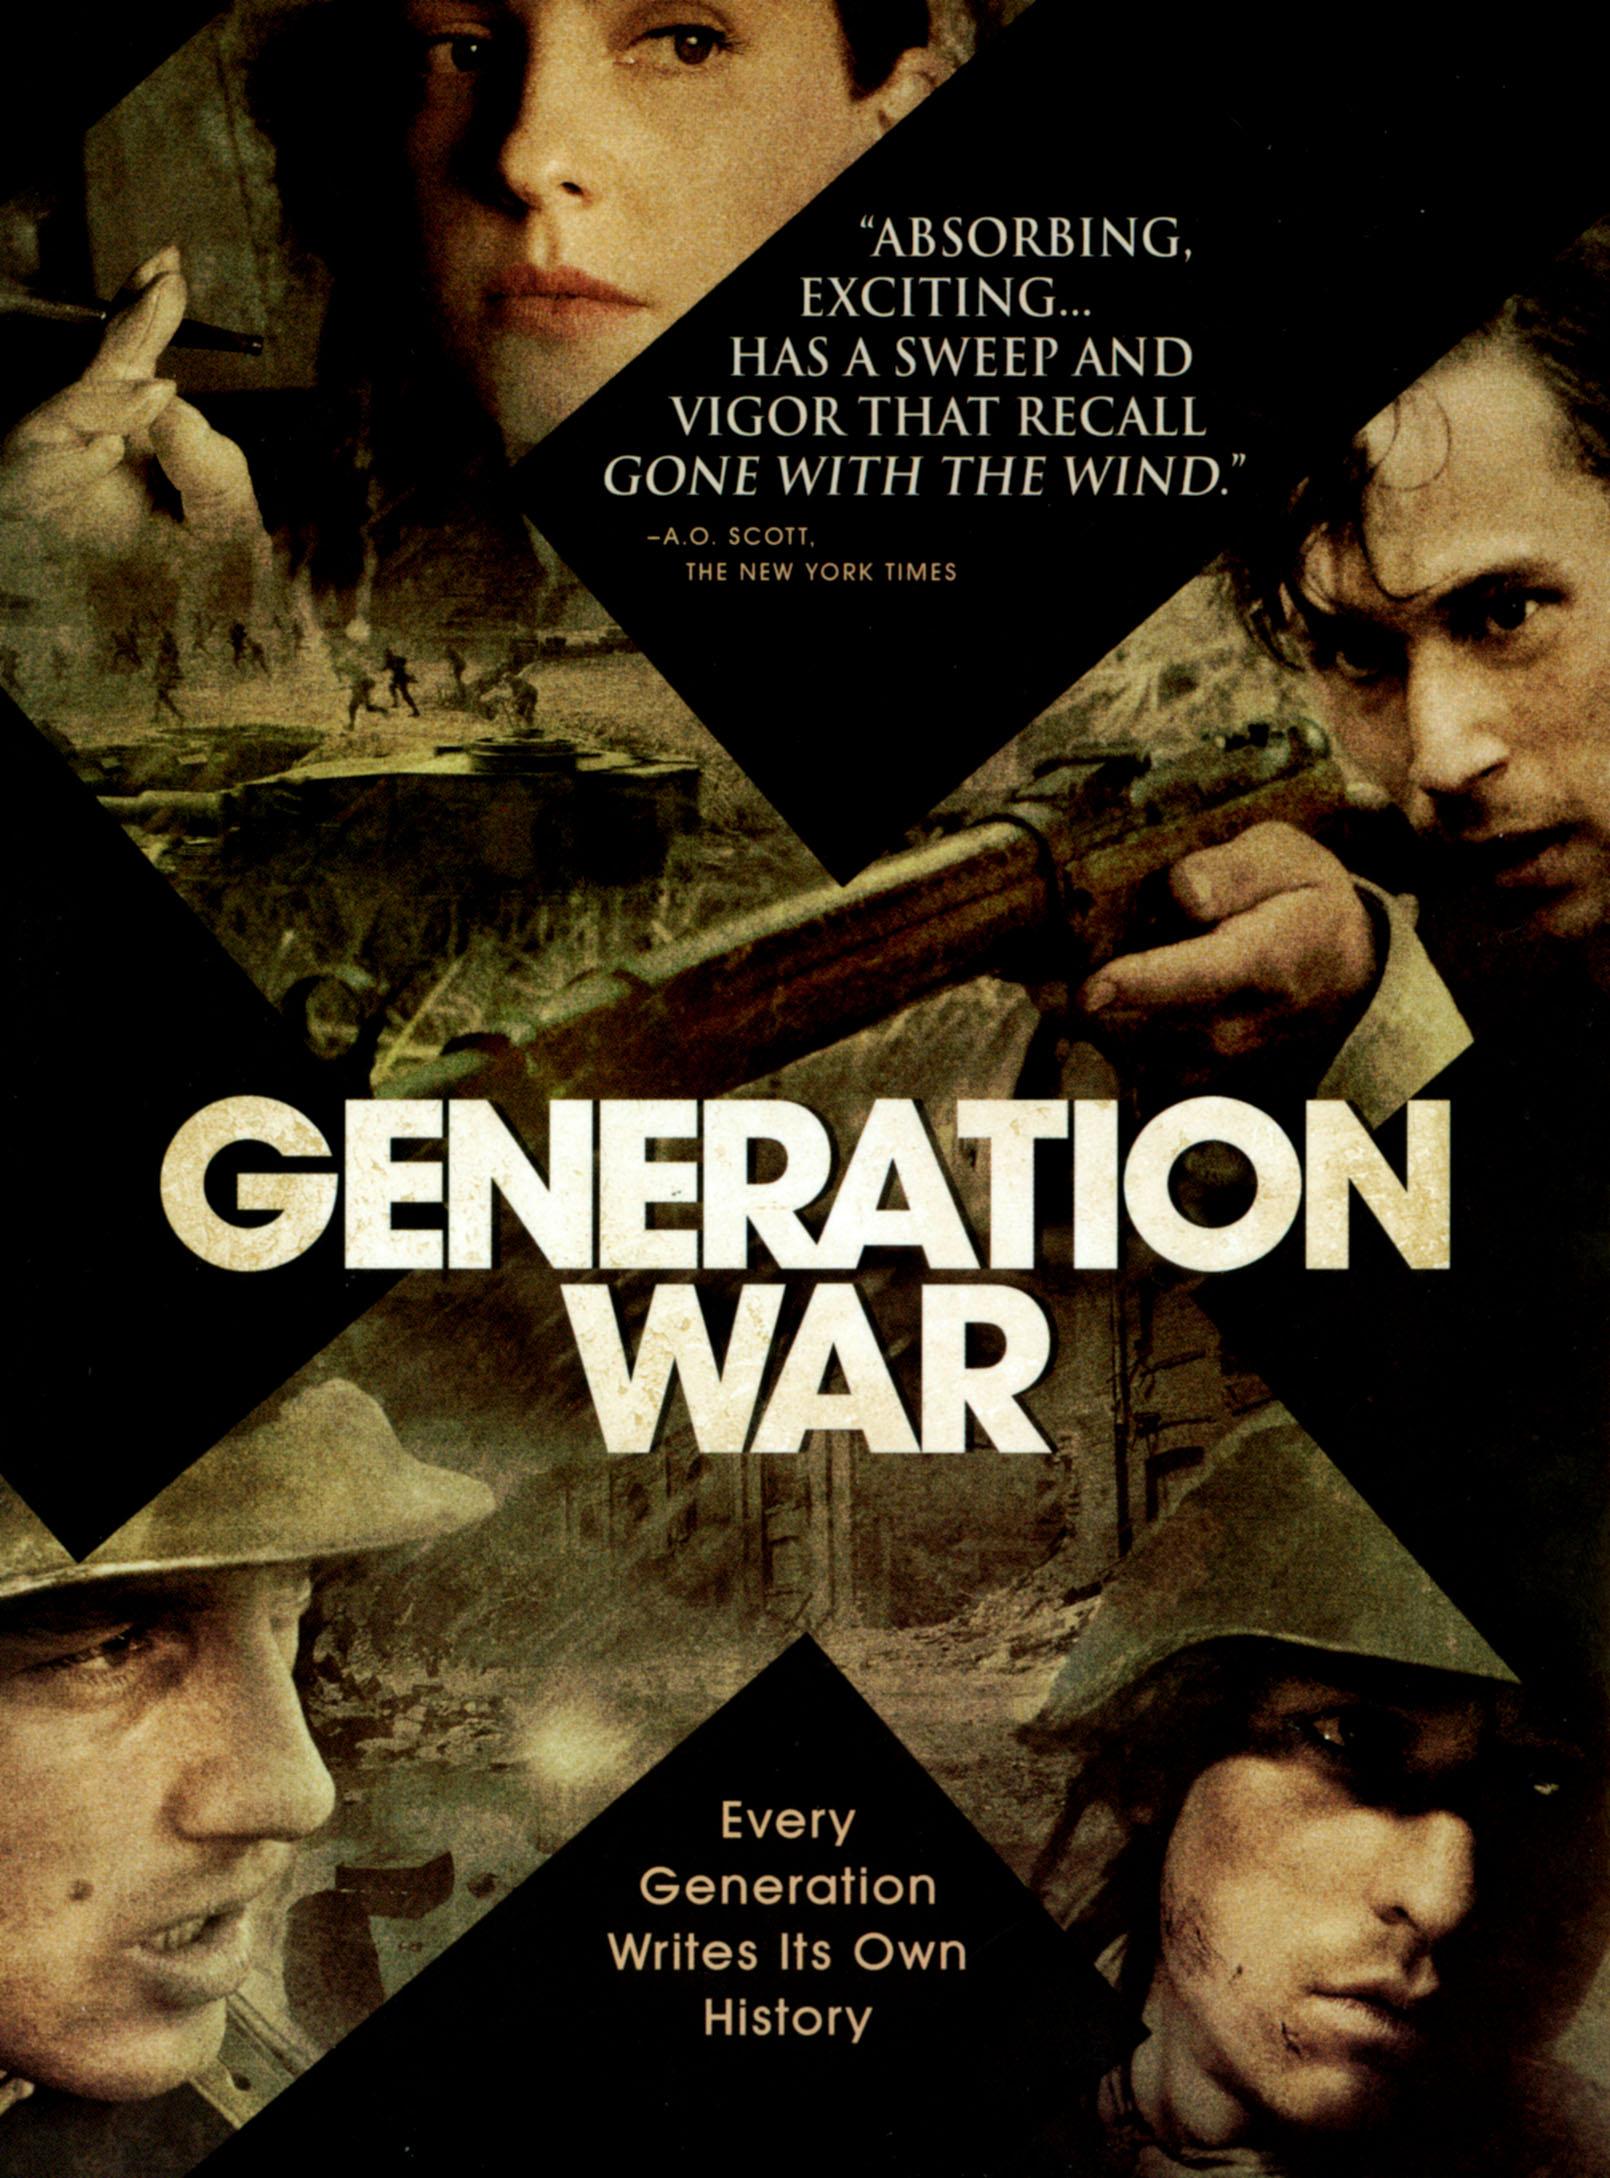 Generation War